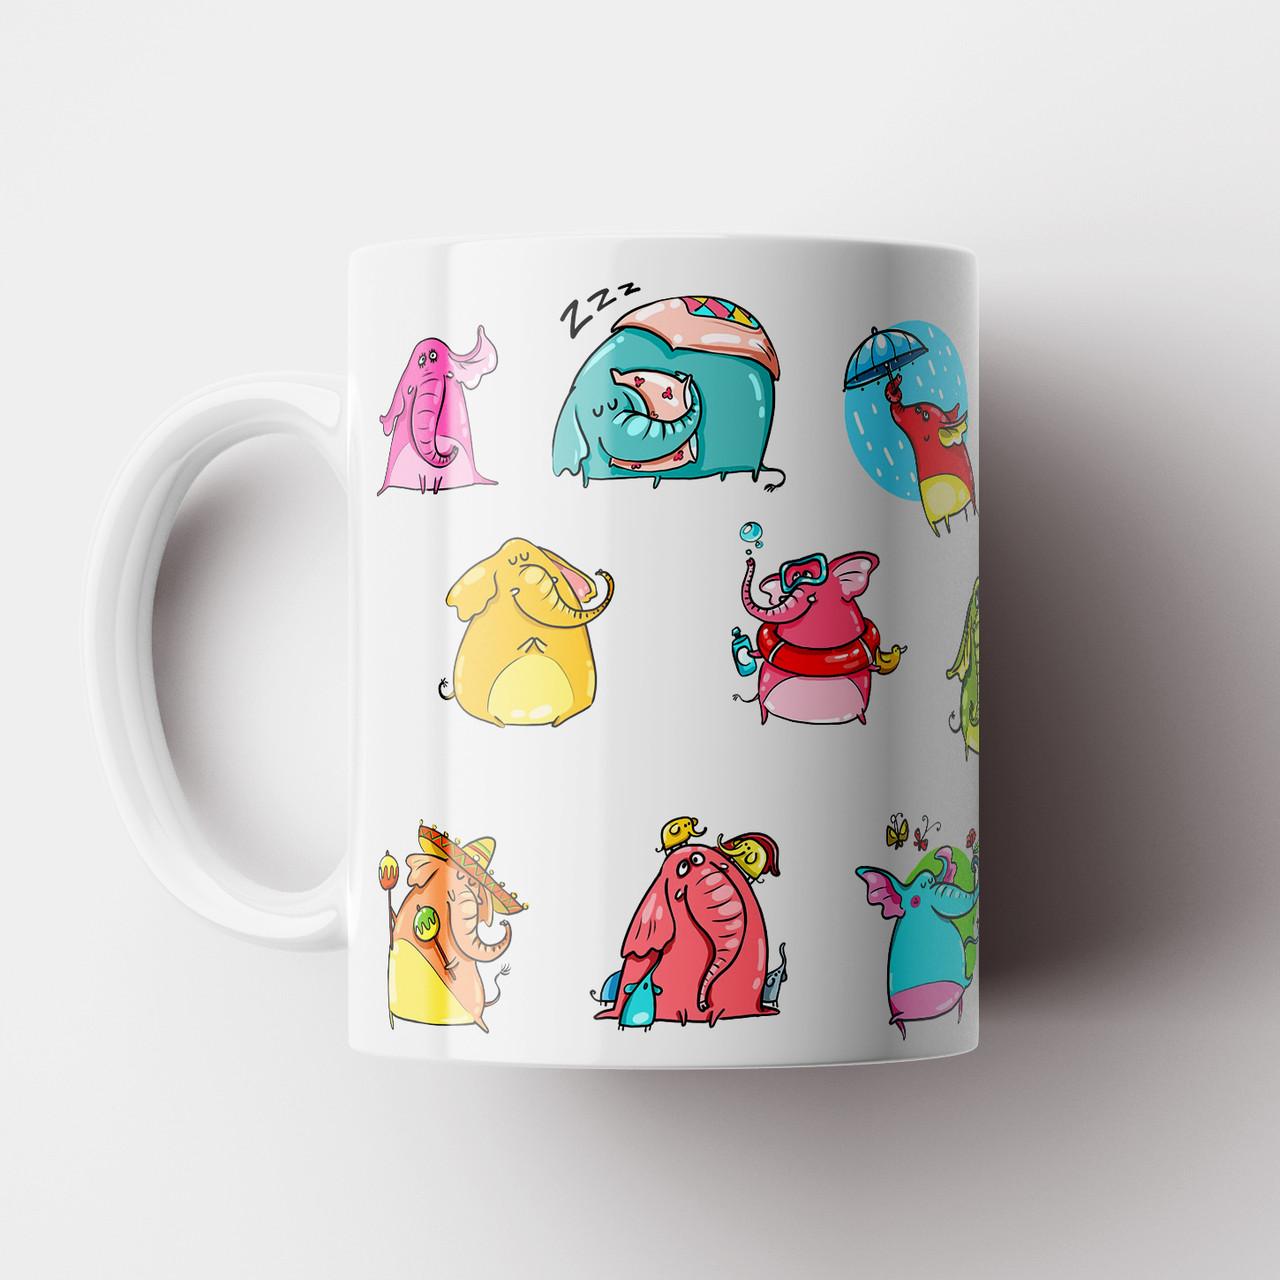 Чашка со слониками. Крудка с принтом. Чашка с фото